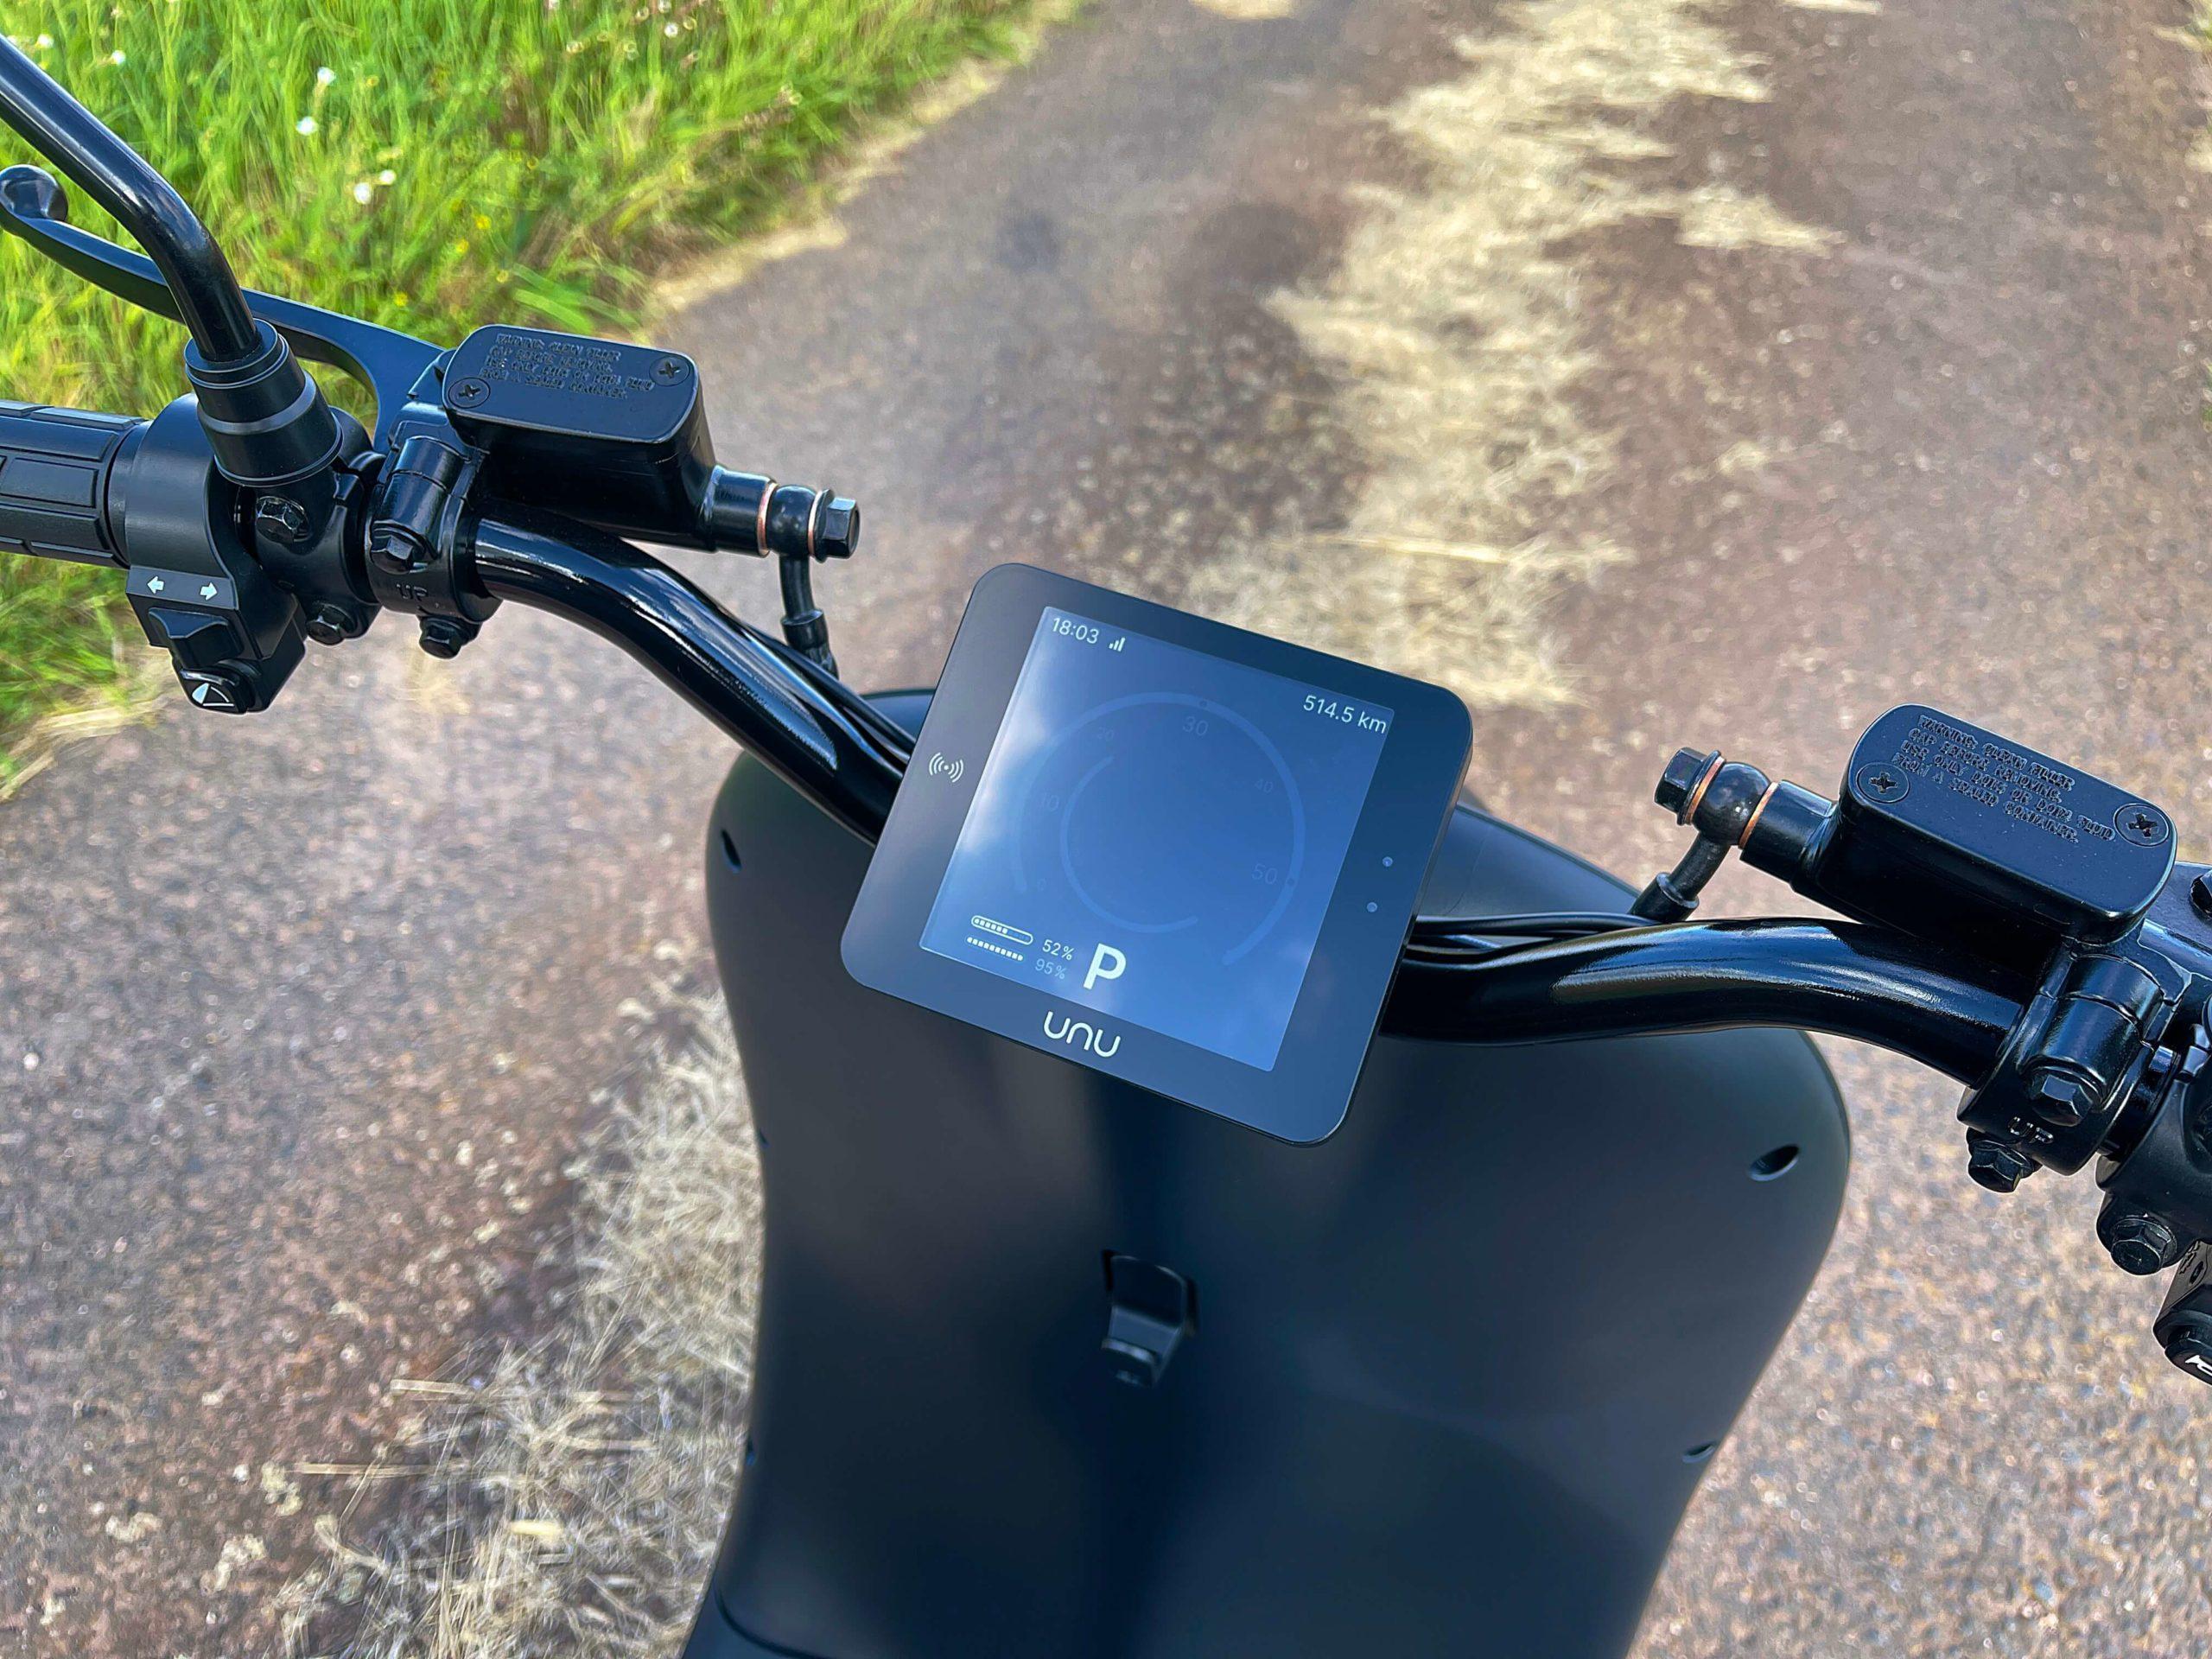 Unu-Scooter-der-smarte-Elektroroller-aus-Berlin16-scaled Unu Scooter - der smarte Elektroroller aus Berlin